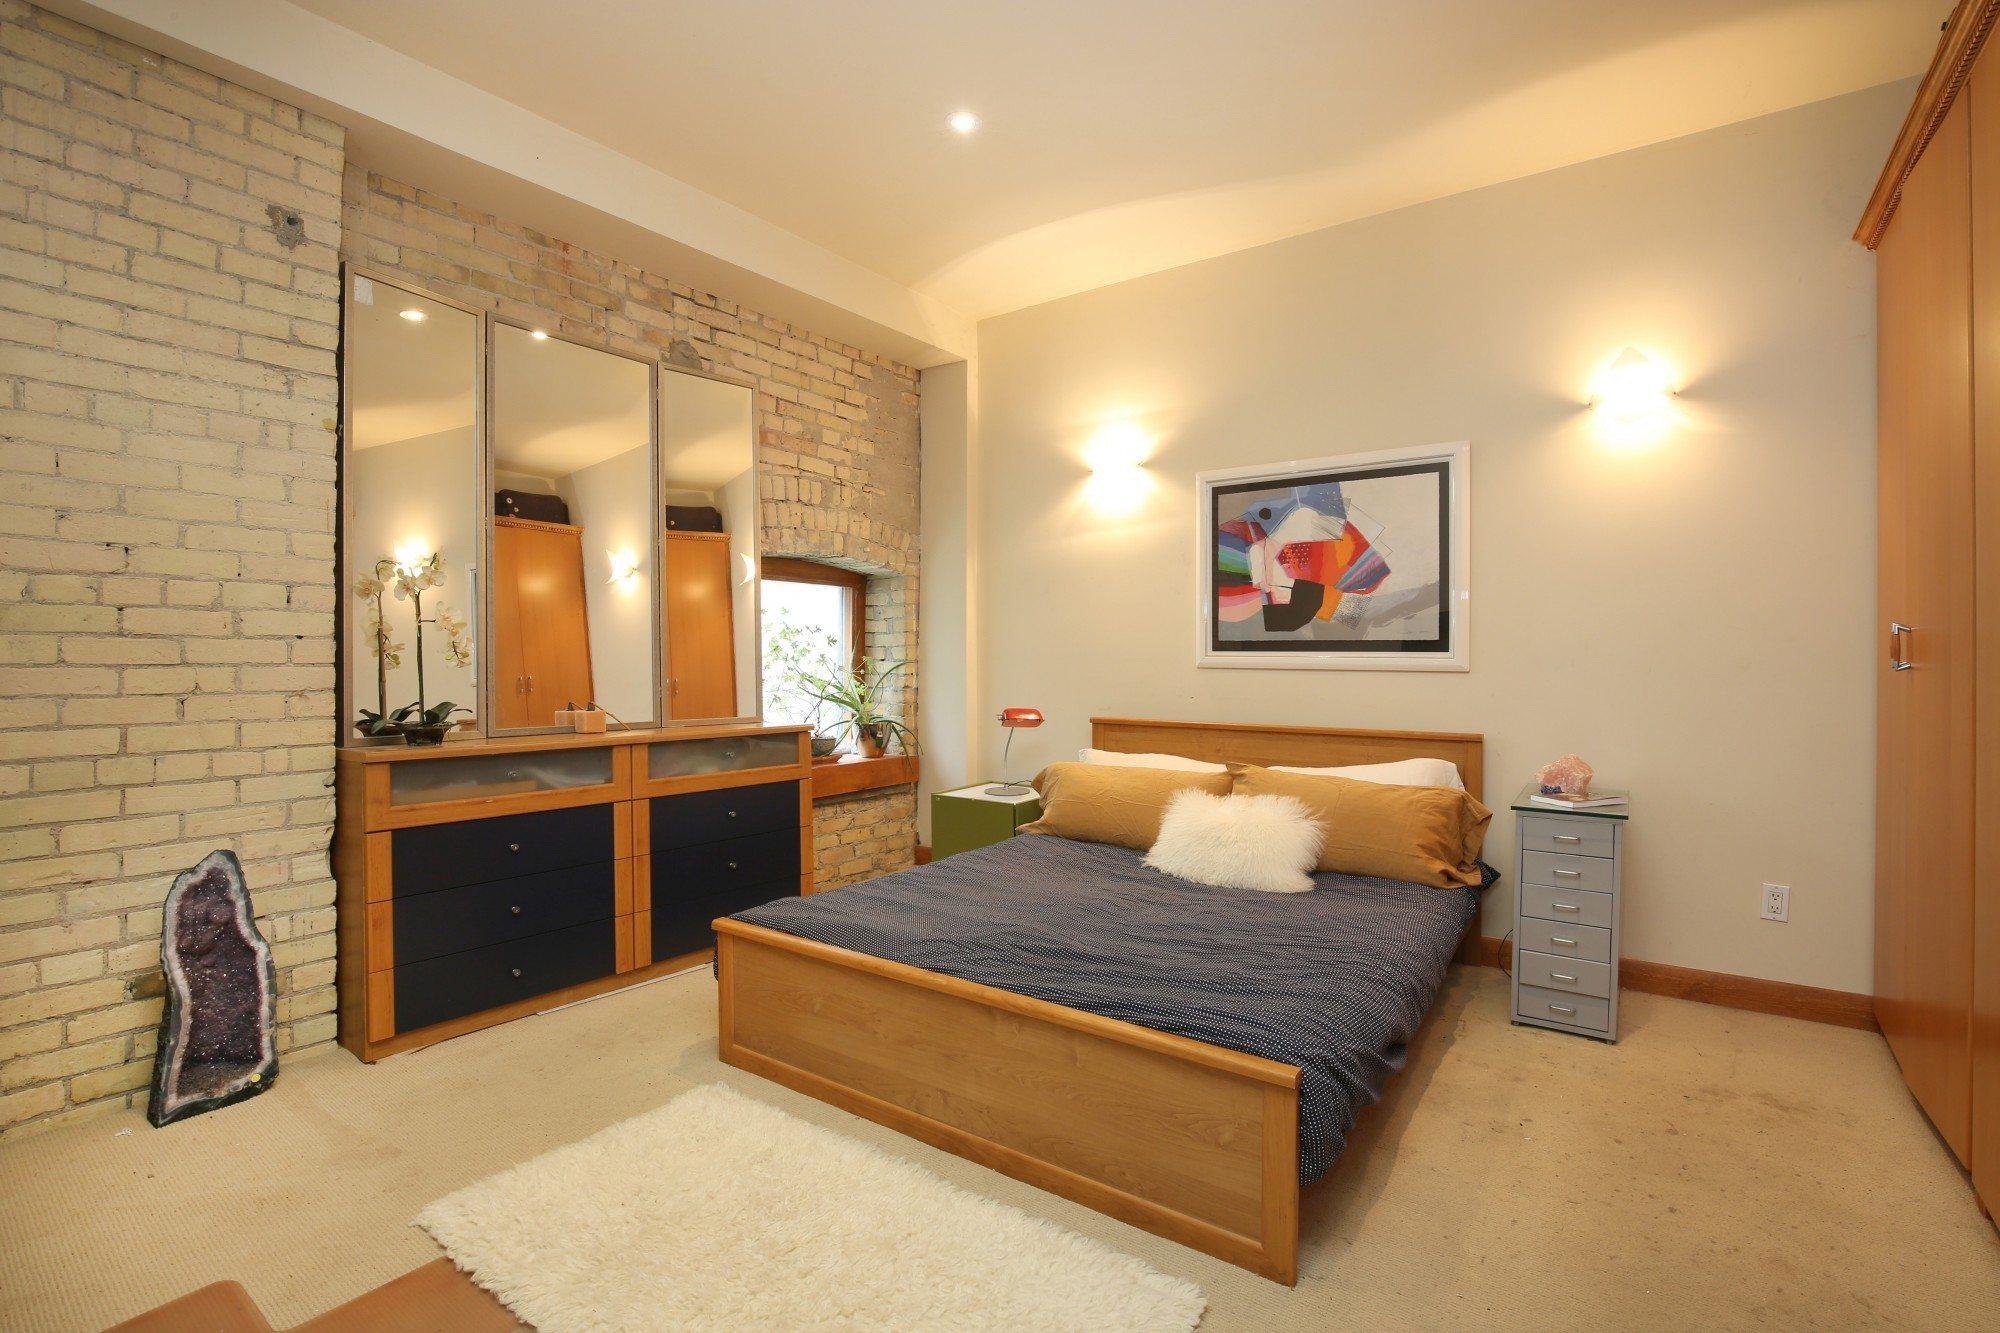 toronto-house-for-sale-154-shuter-street-5